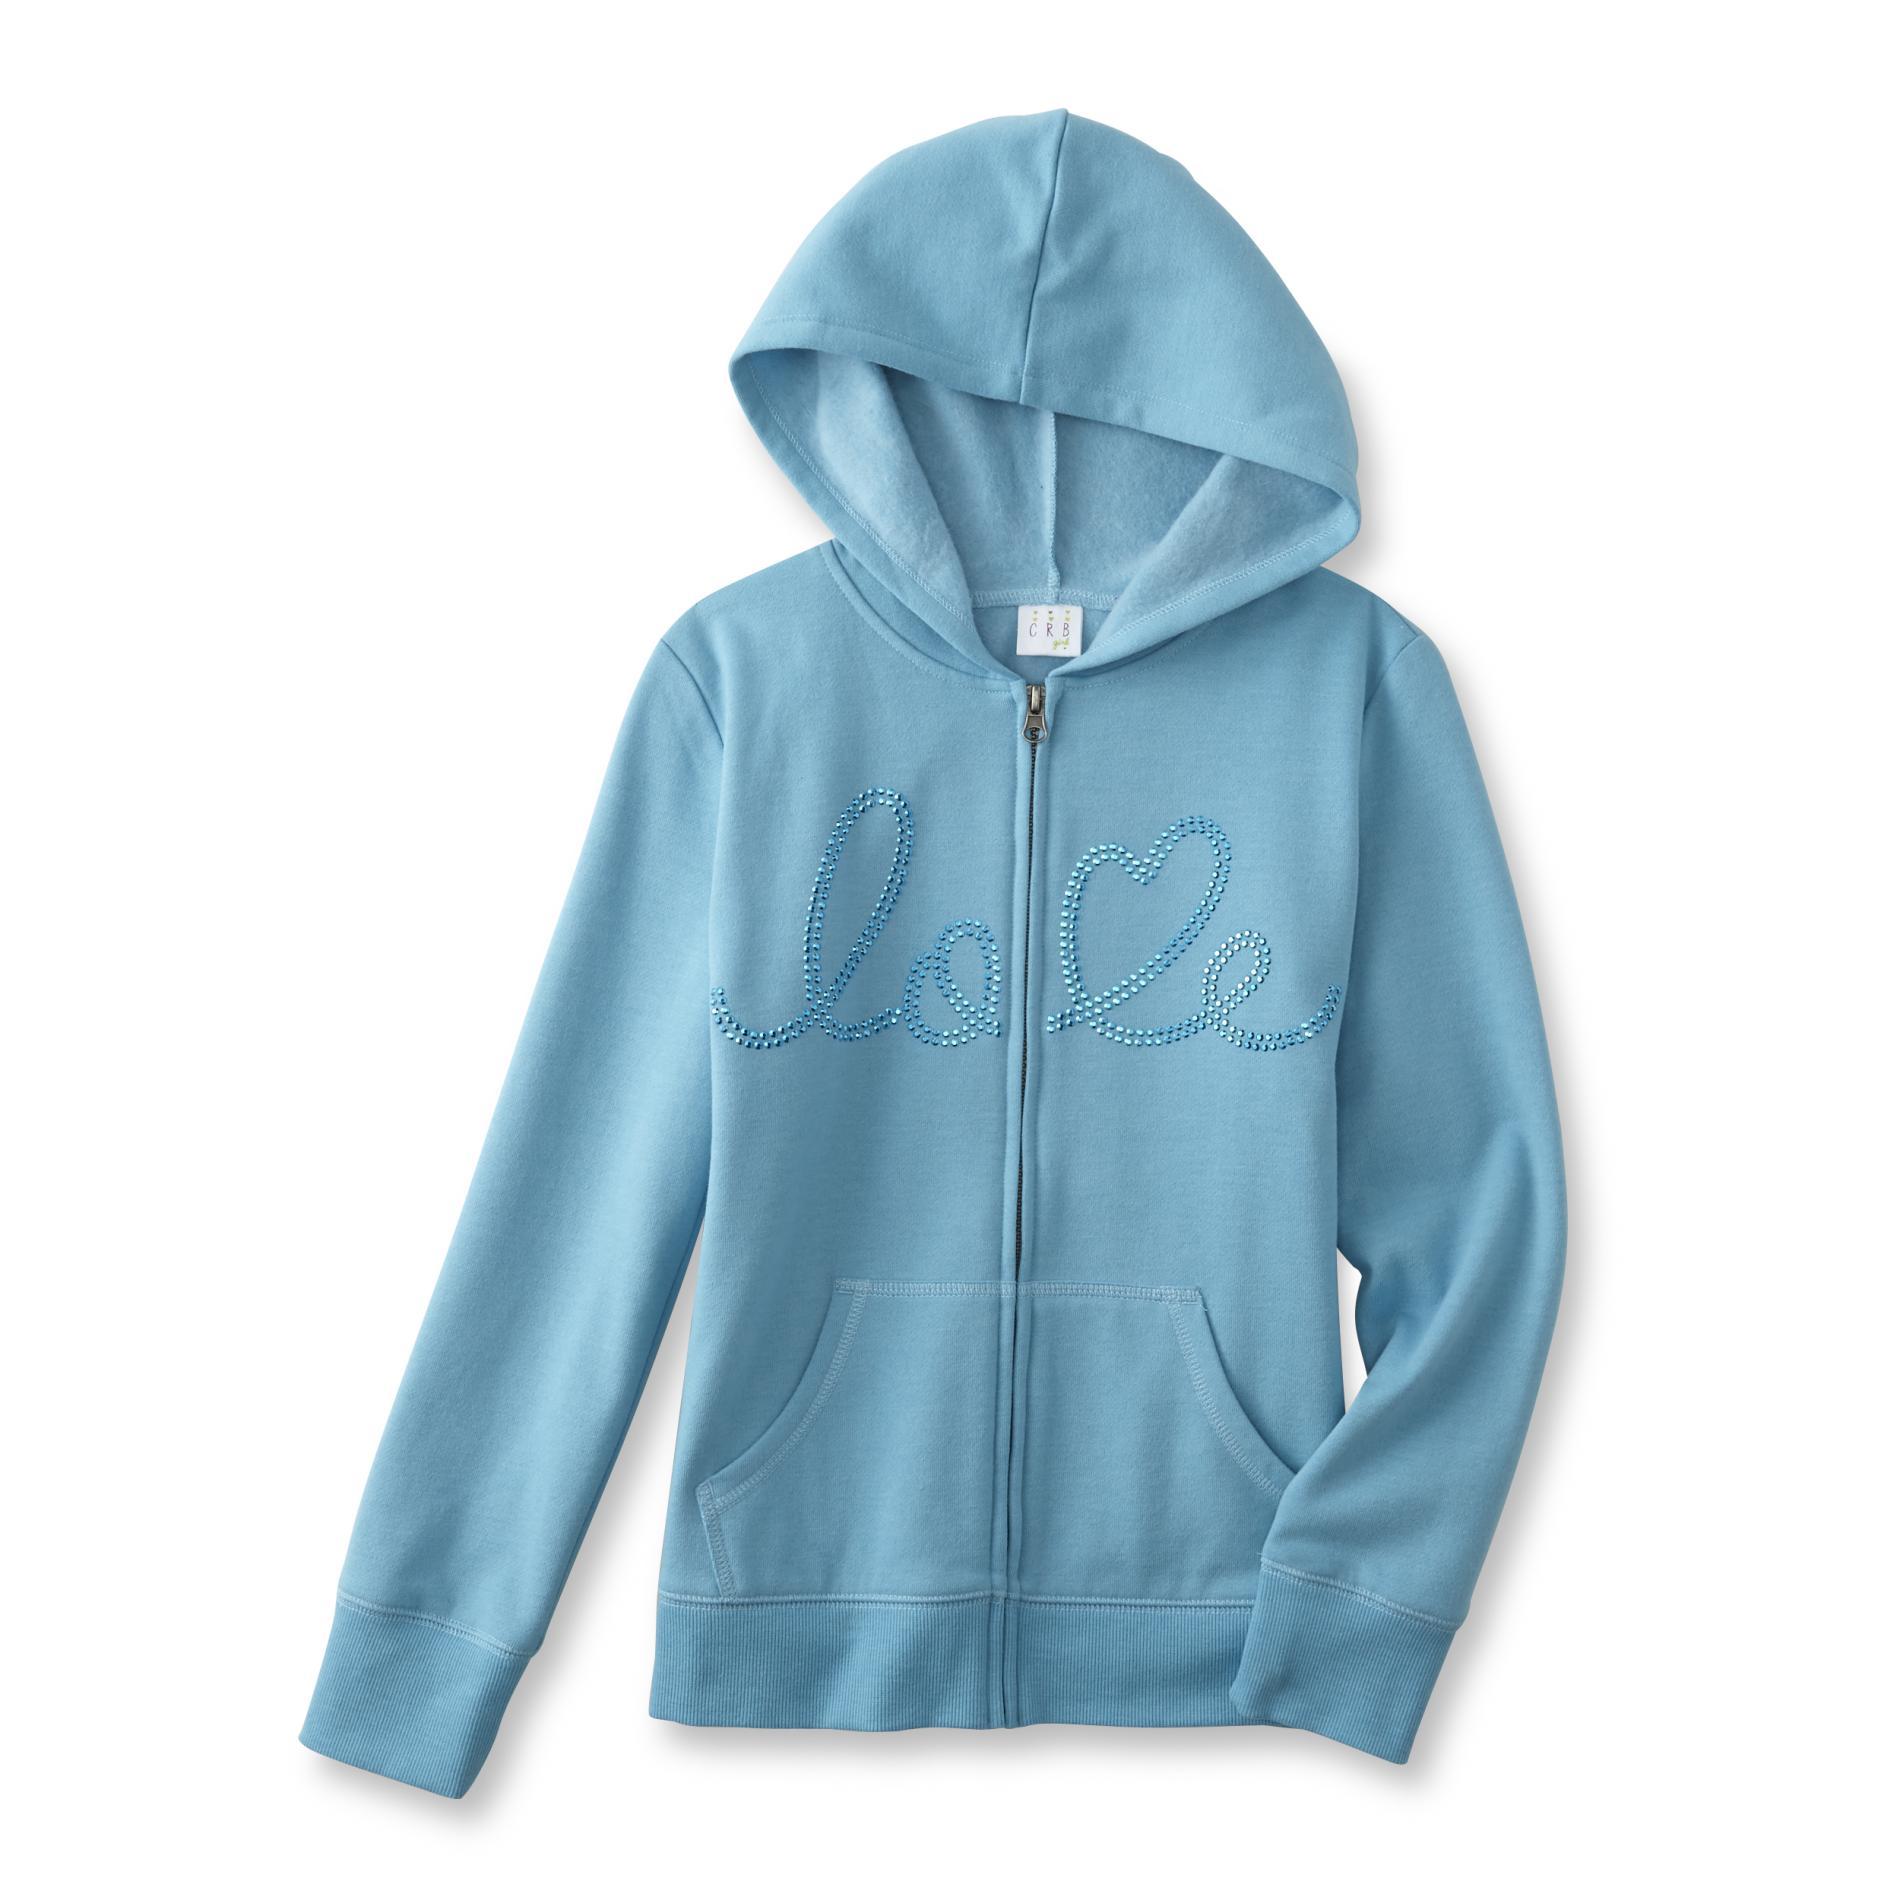 CRB Girl Girl's Graphic Hoodie Jacket - Love PartNumber: 077VA88932012P MfgPartNumber: GF6CG31008GP